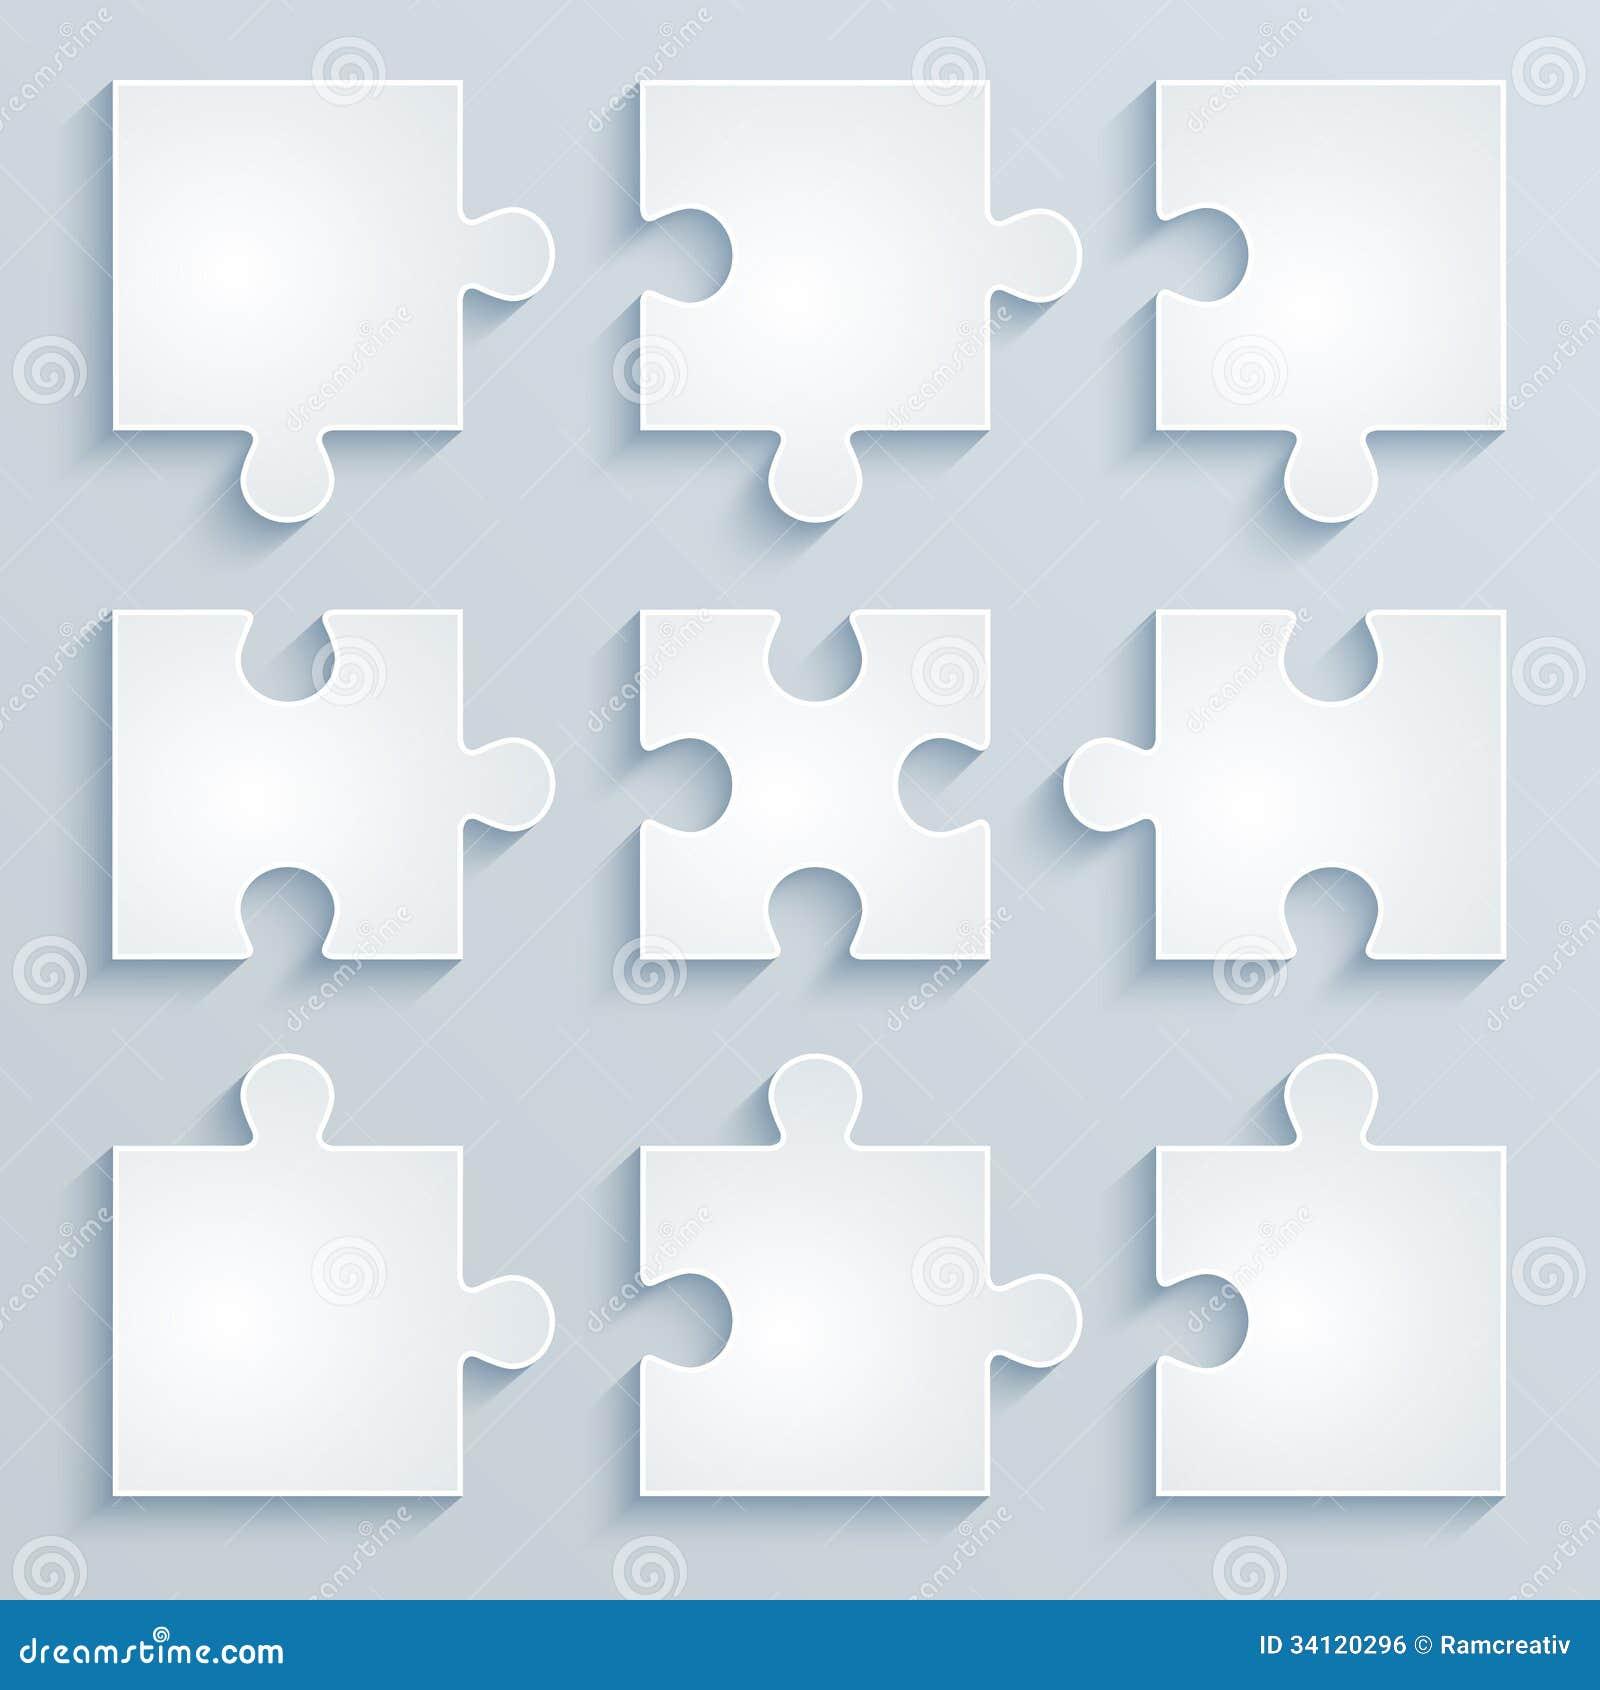 Parts of paper